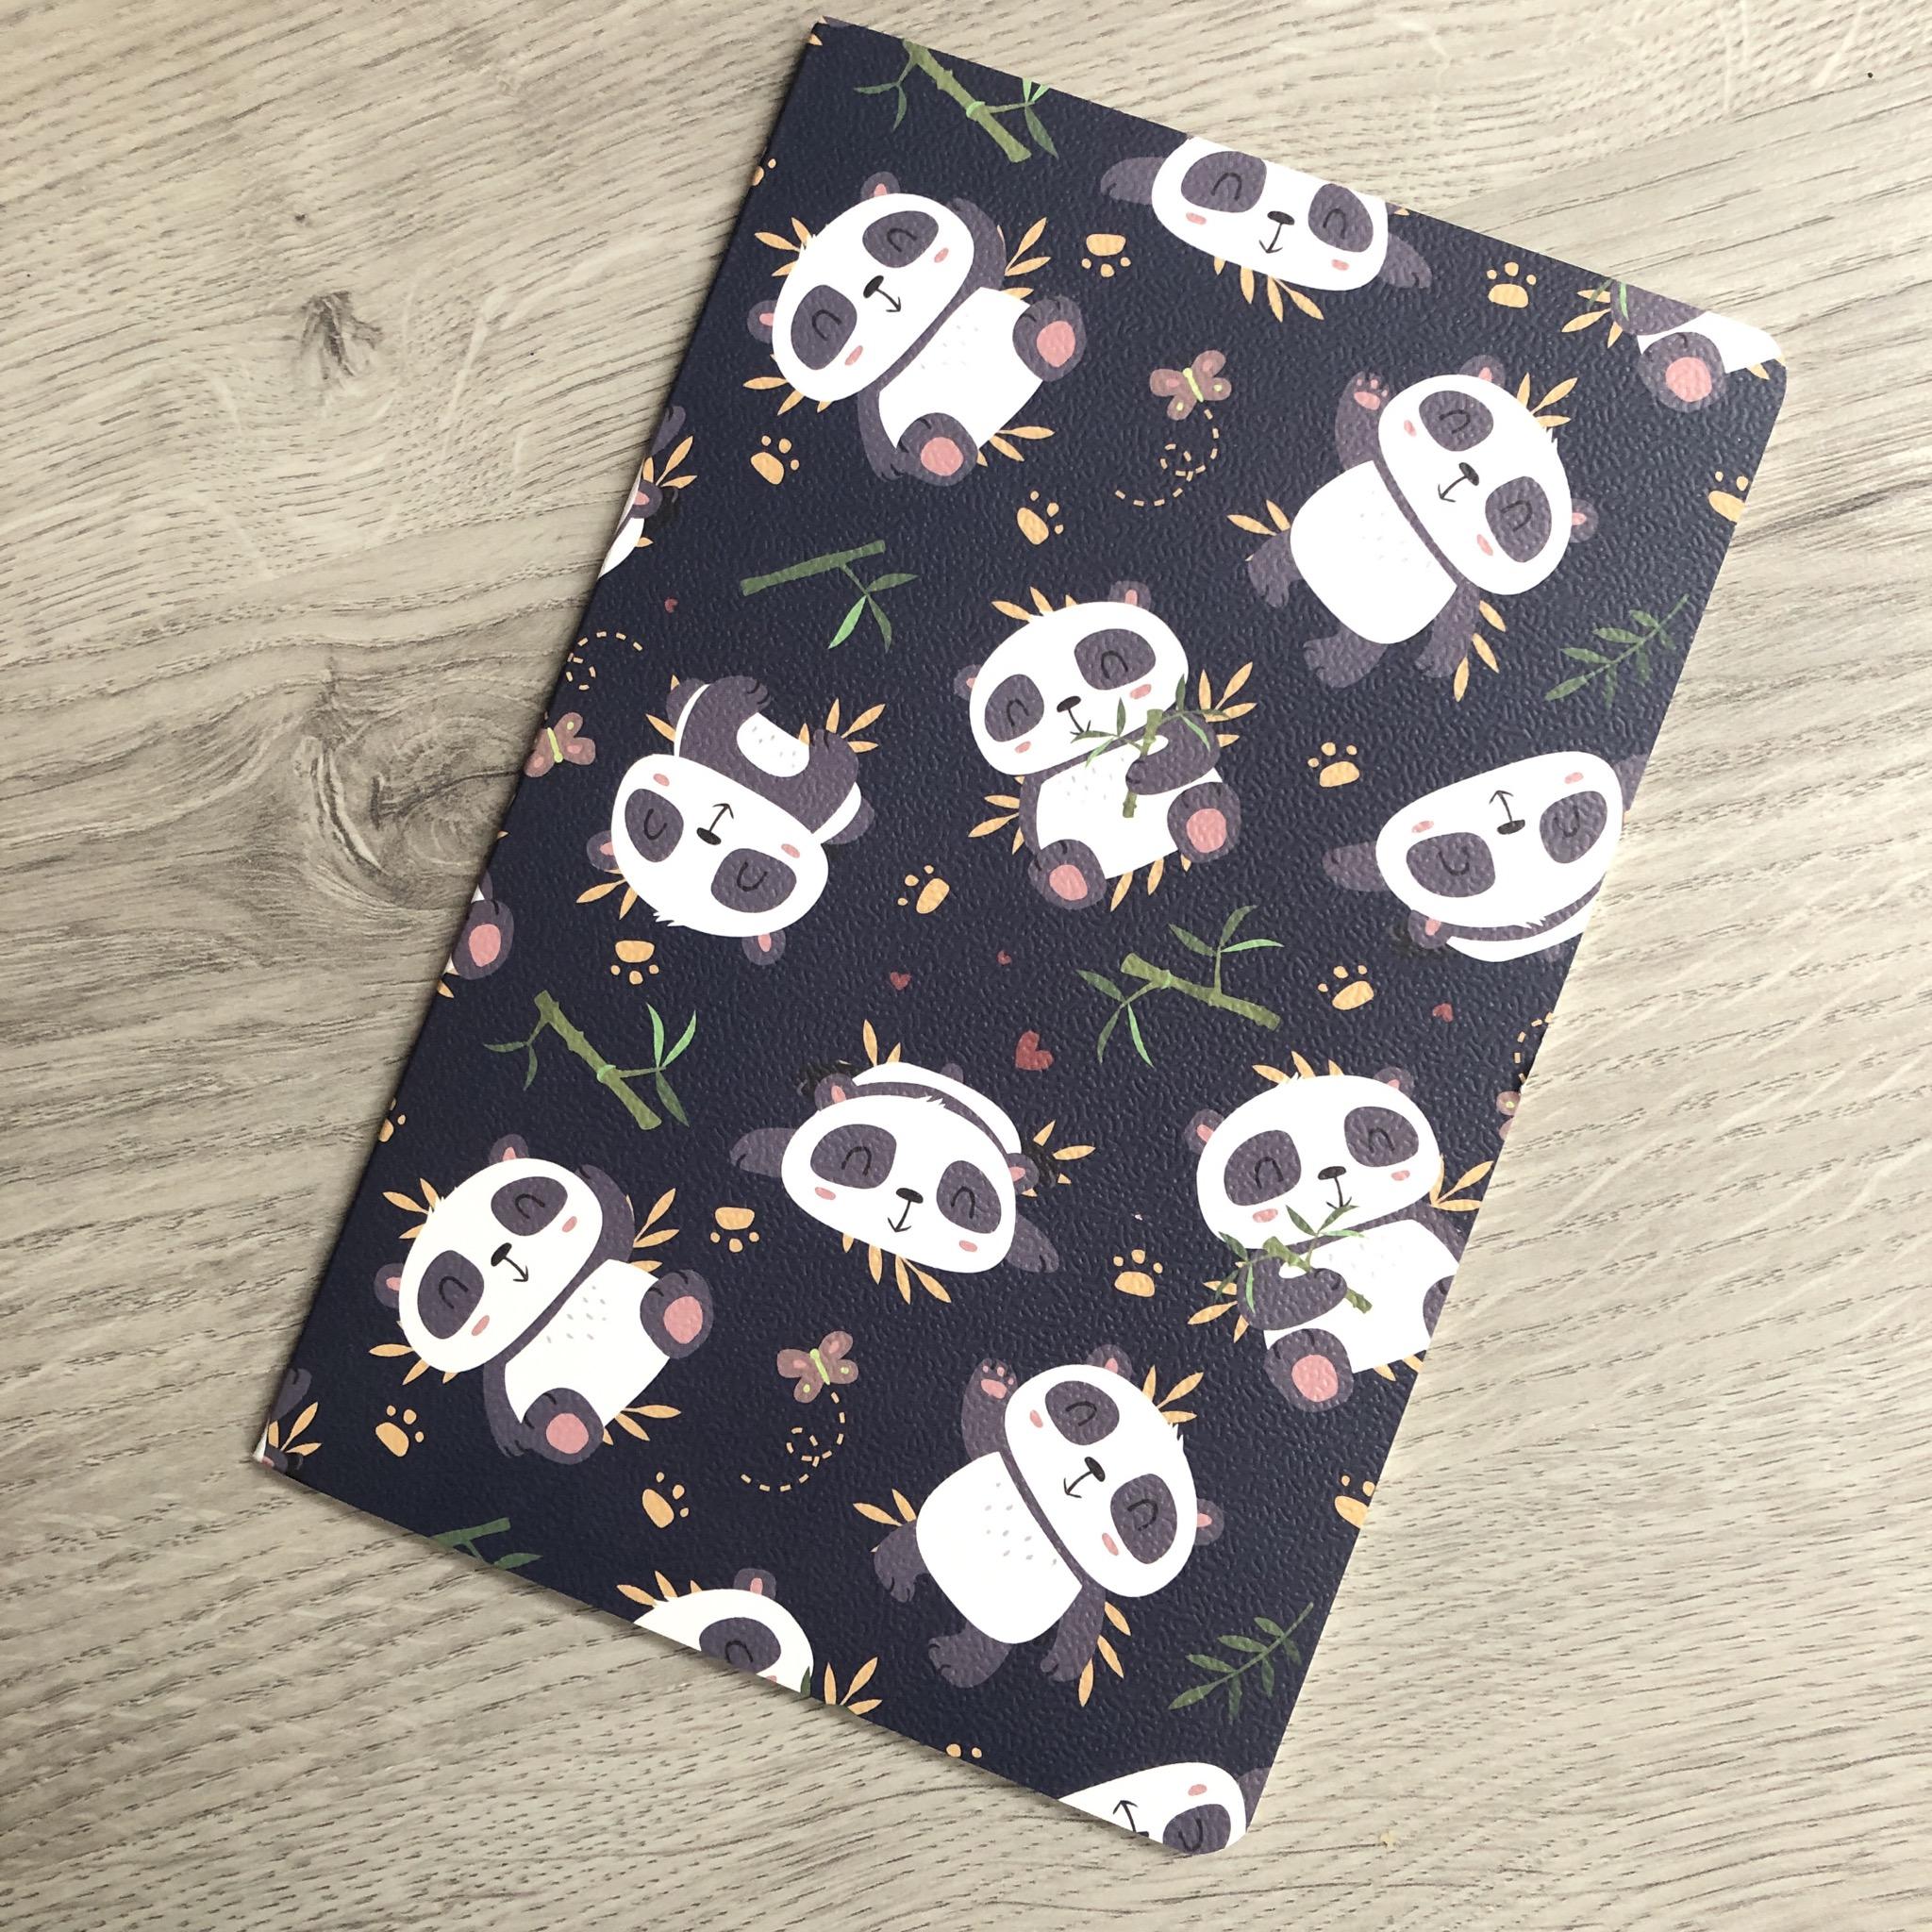 Panda notebook. Lined paper notebook